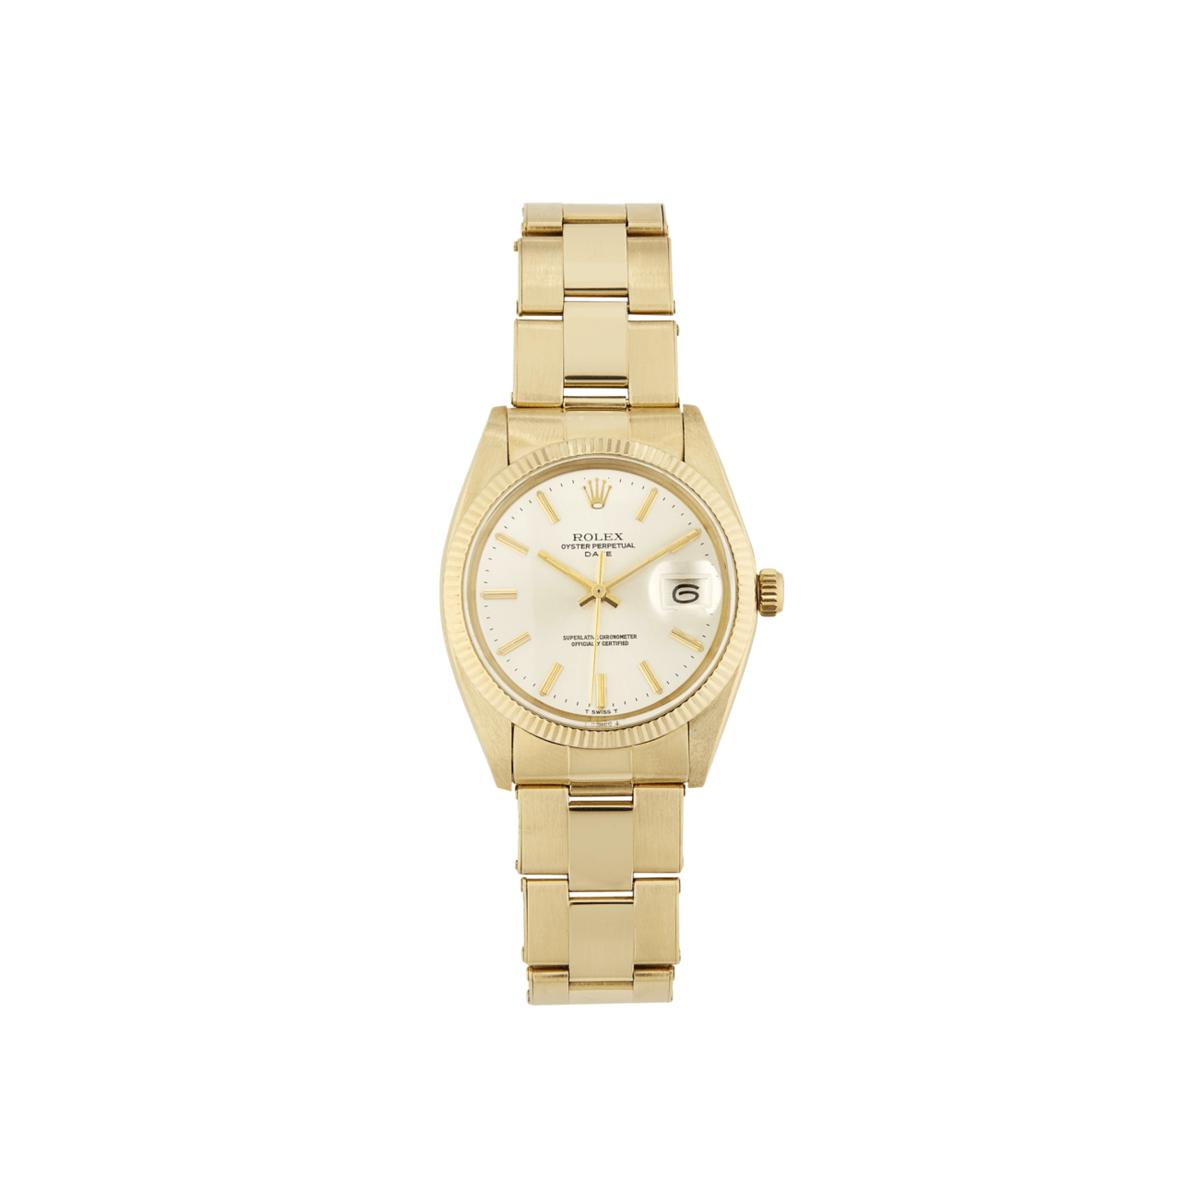 Bob's Watches Rolex Men's Date 14ct Yellow gold 34mm Model 1503